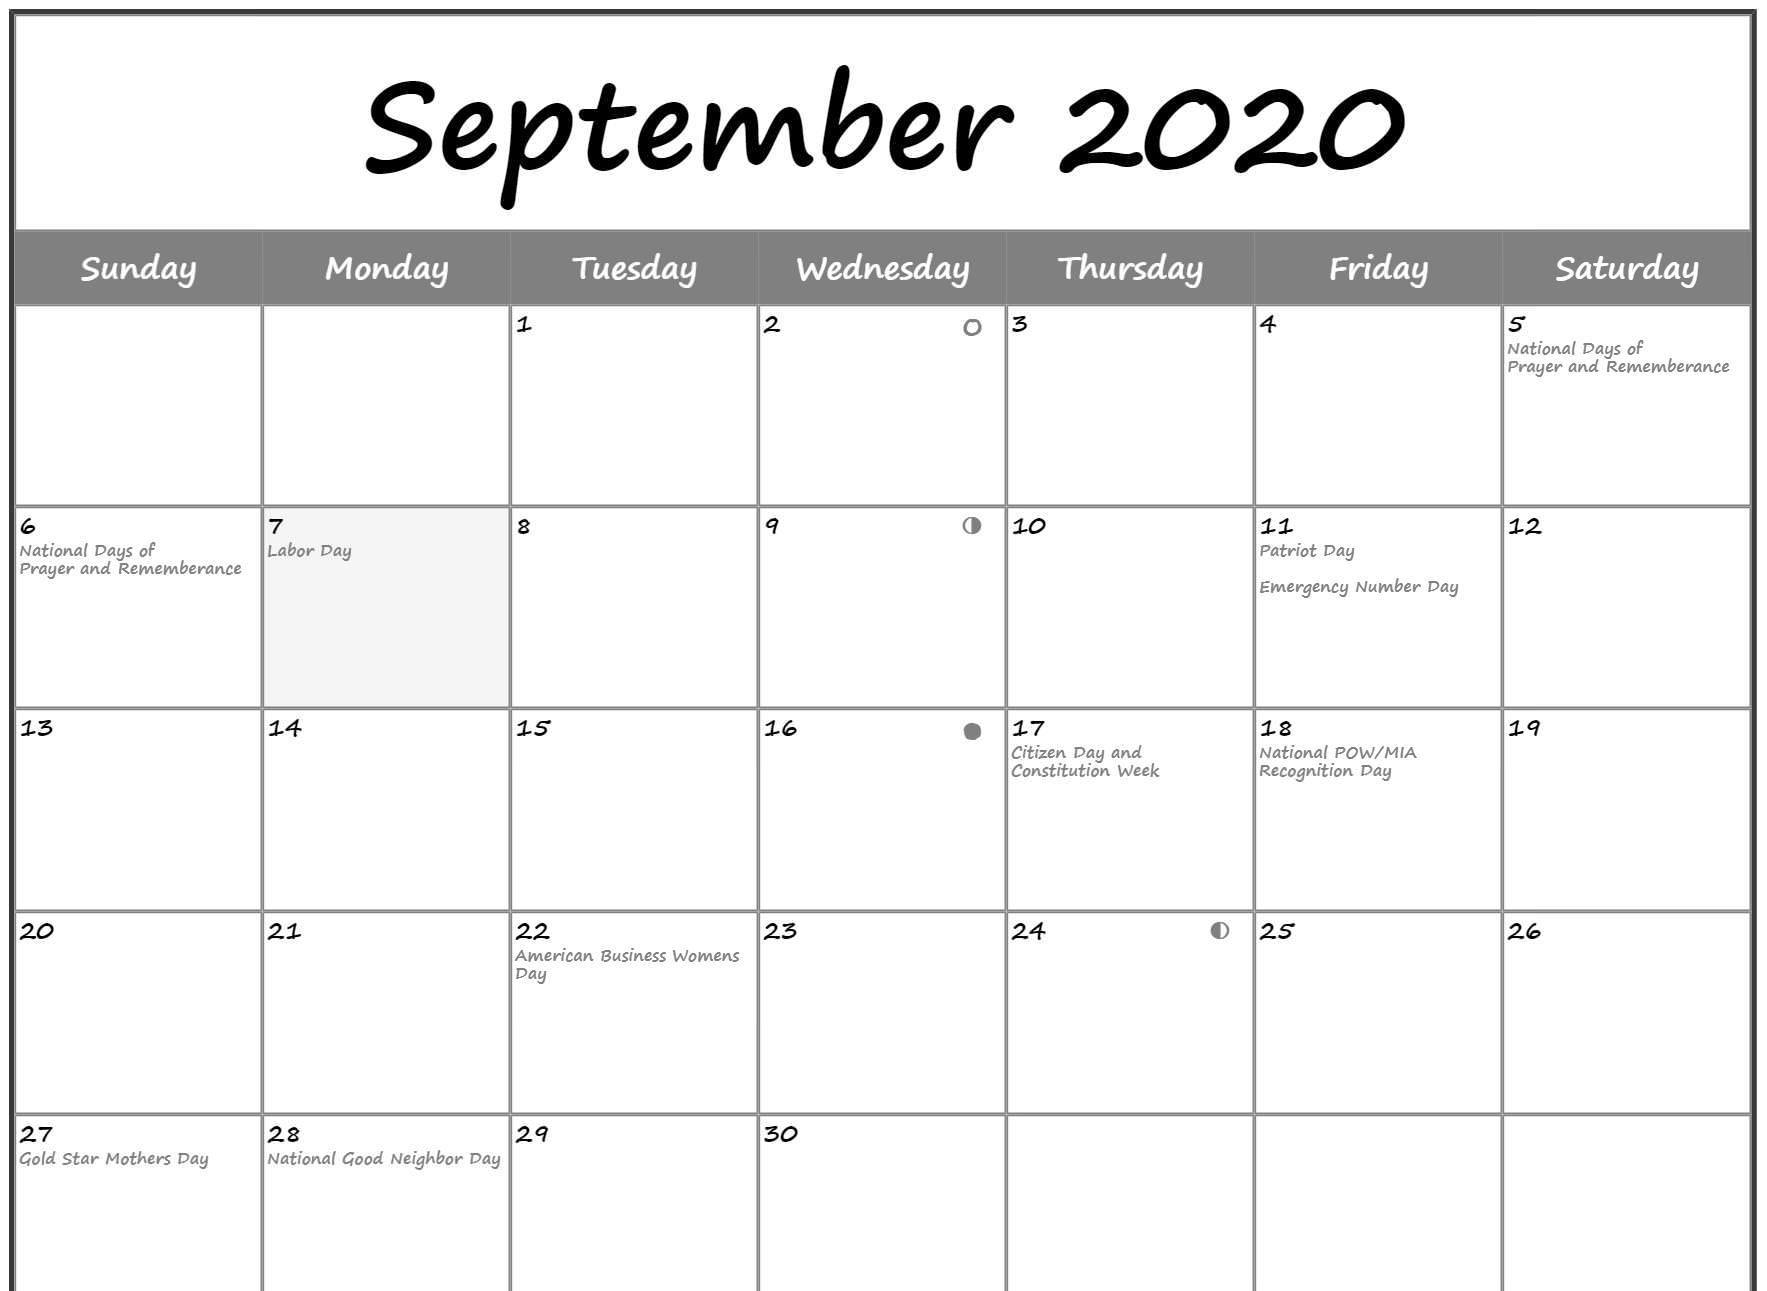 September 2020 Calendar with Holidays US